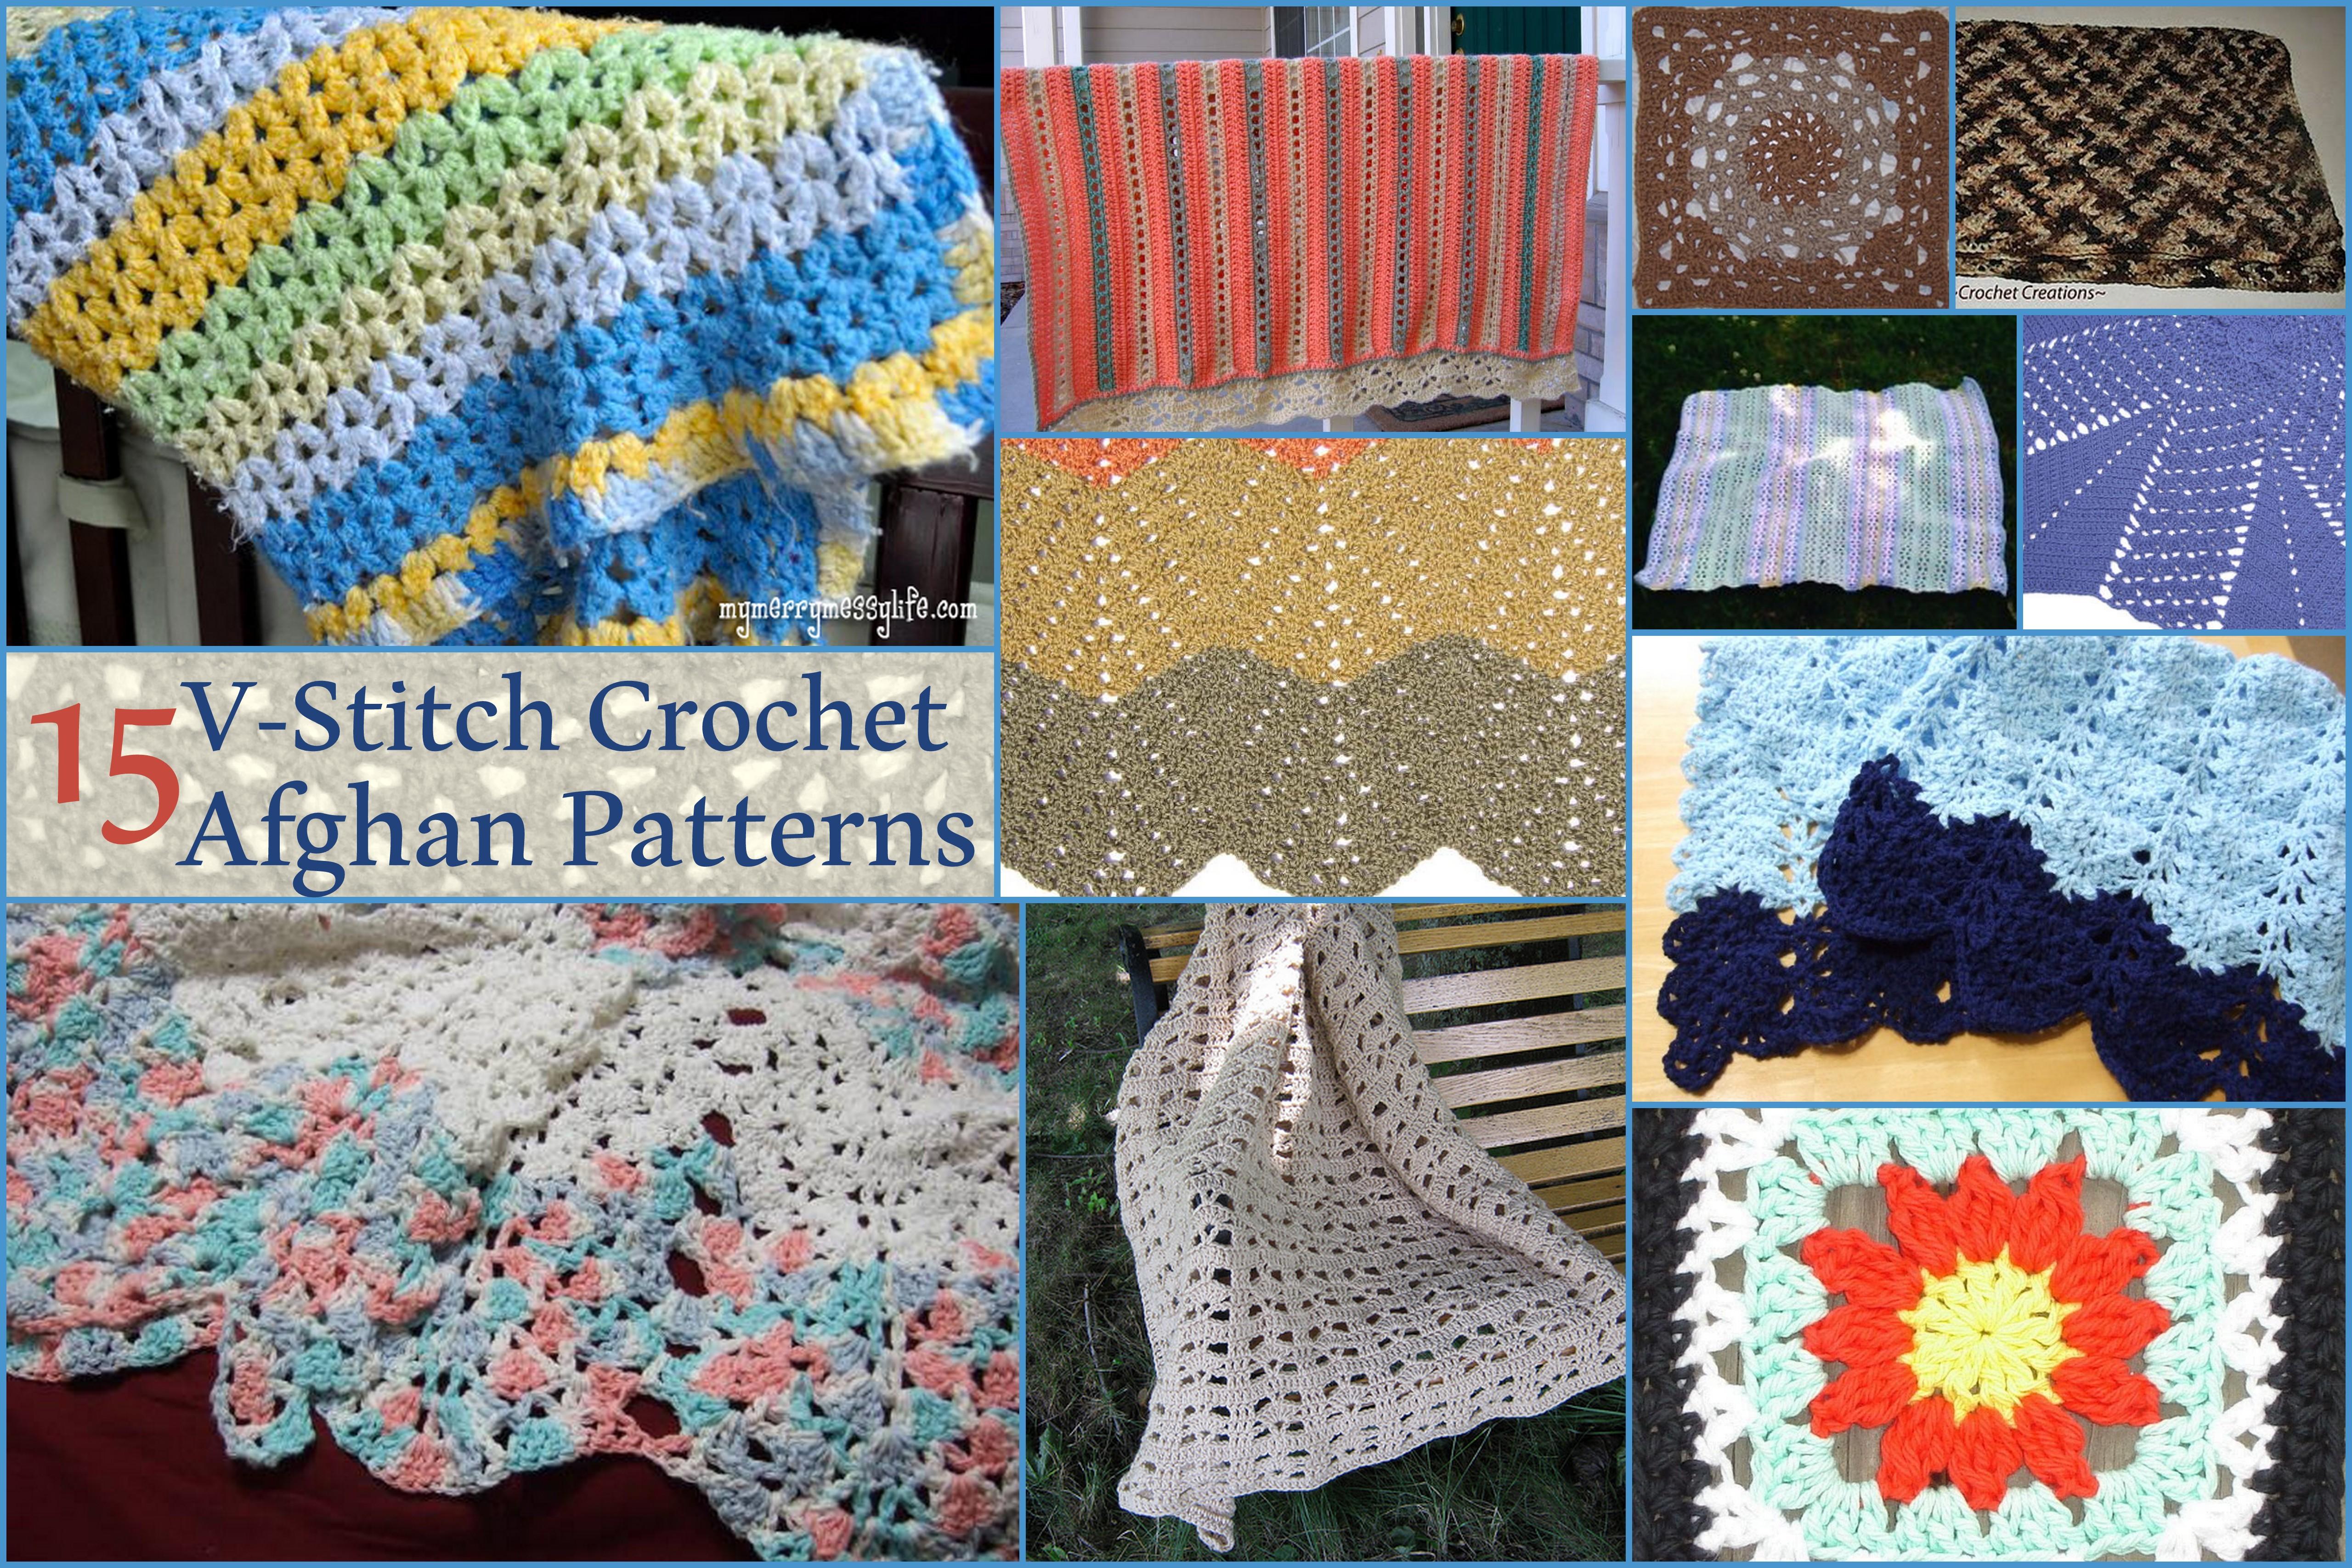 Victorious V-Stitch Crochet Patterns - Stitch and Unwind